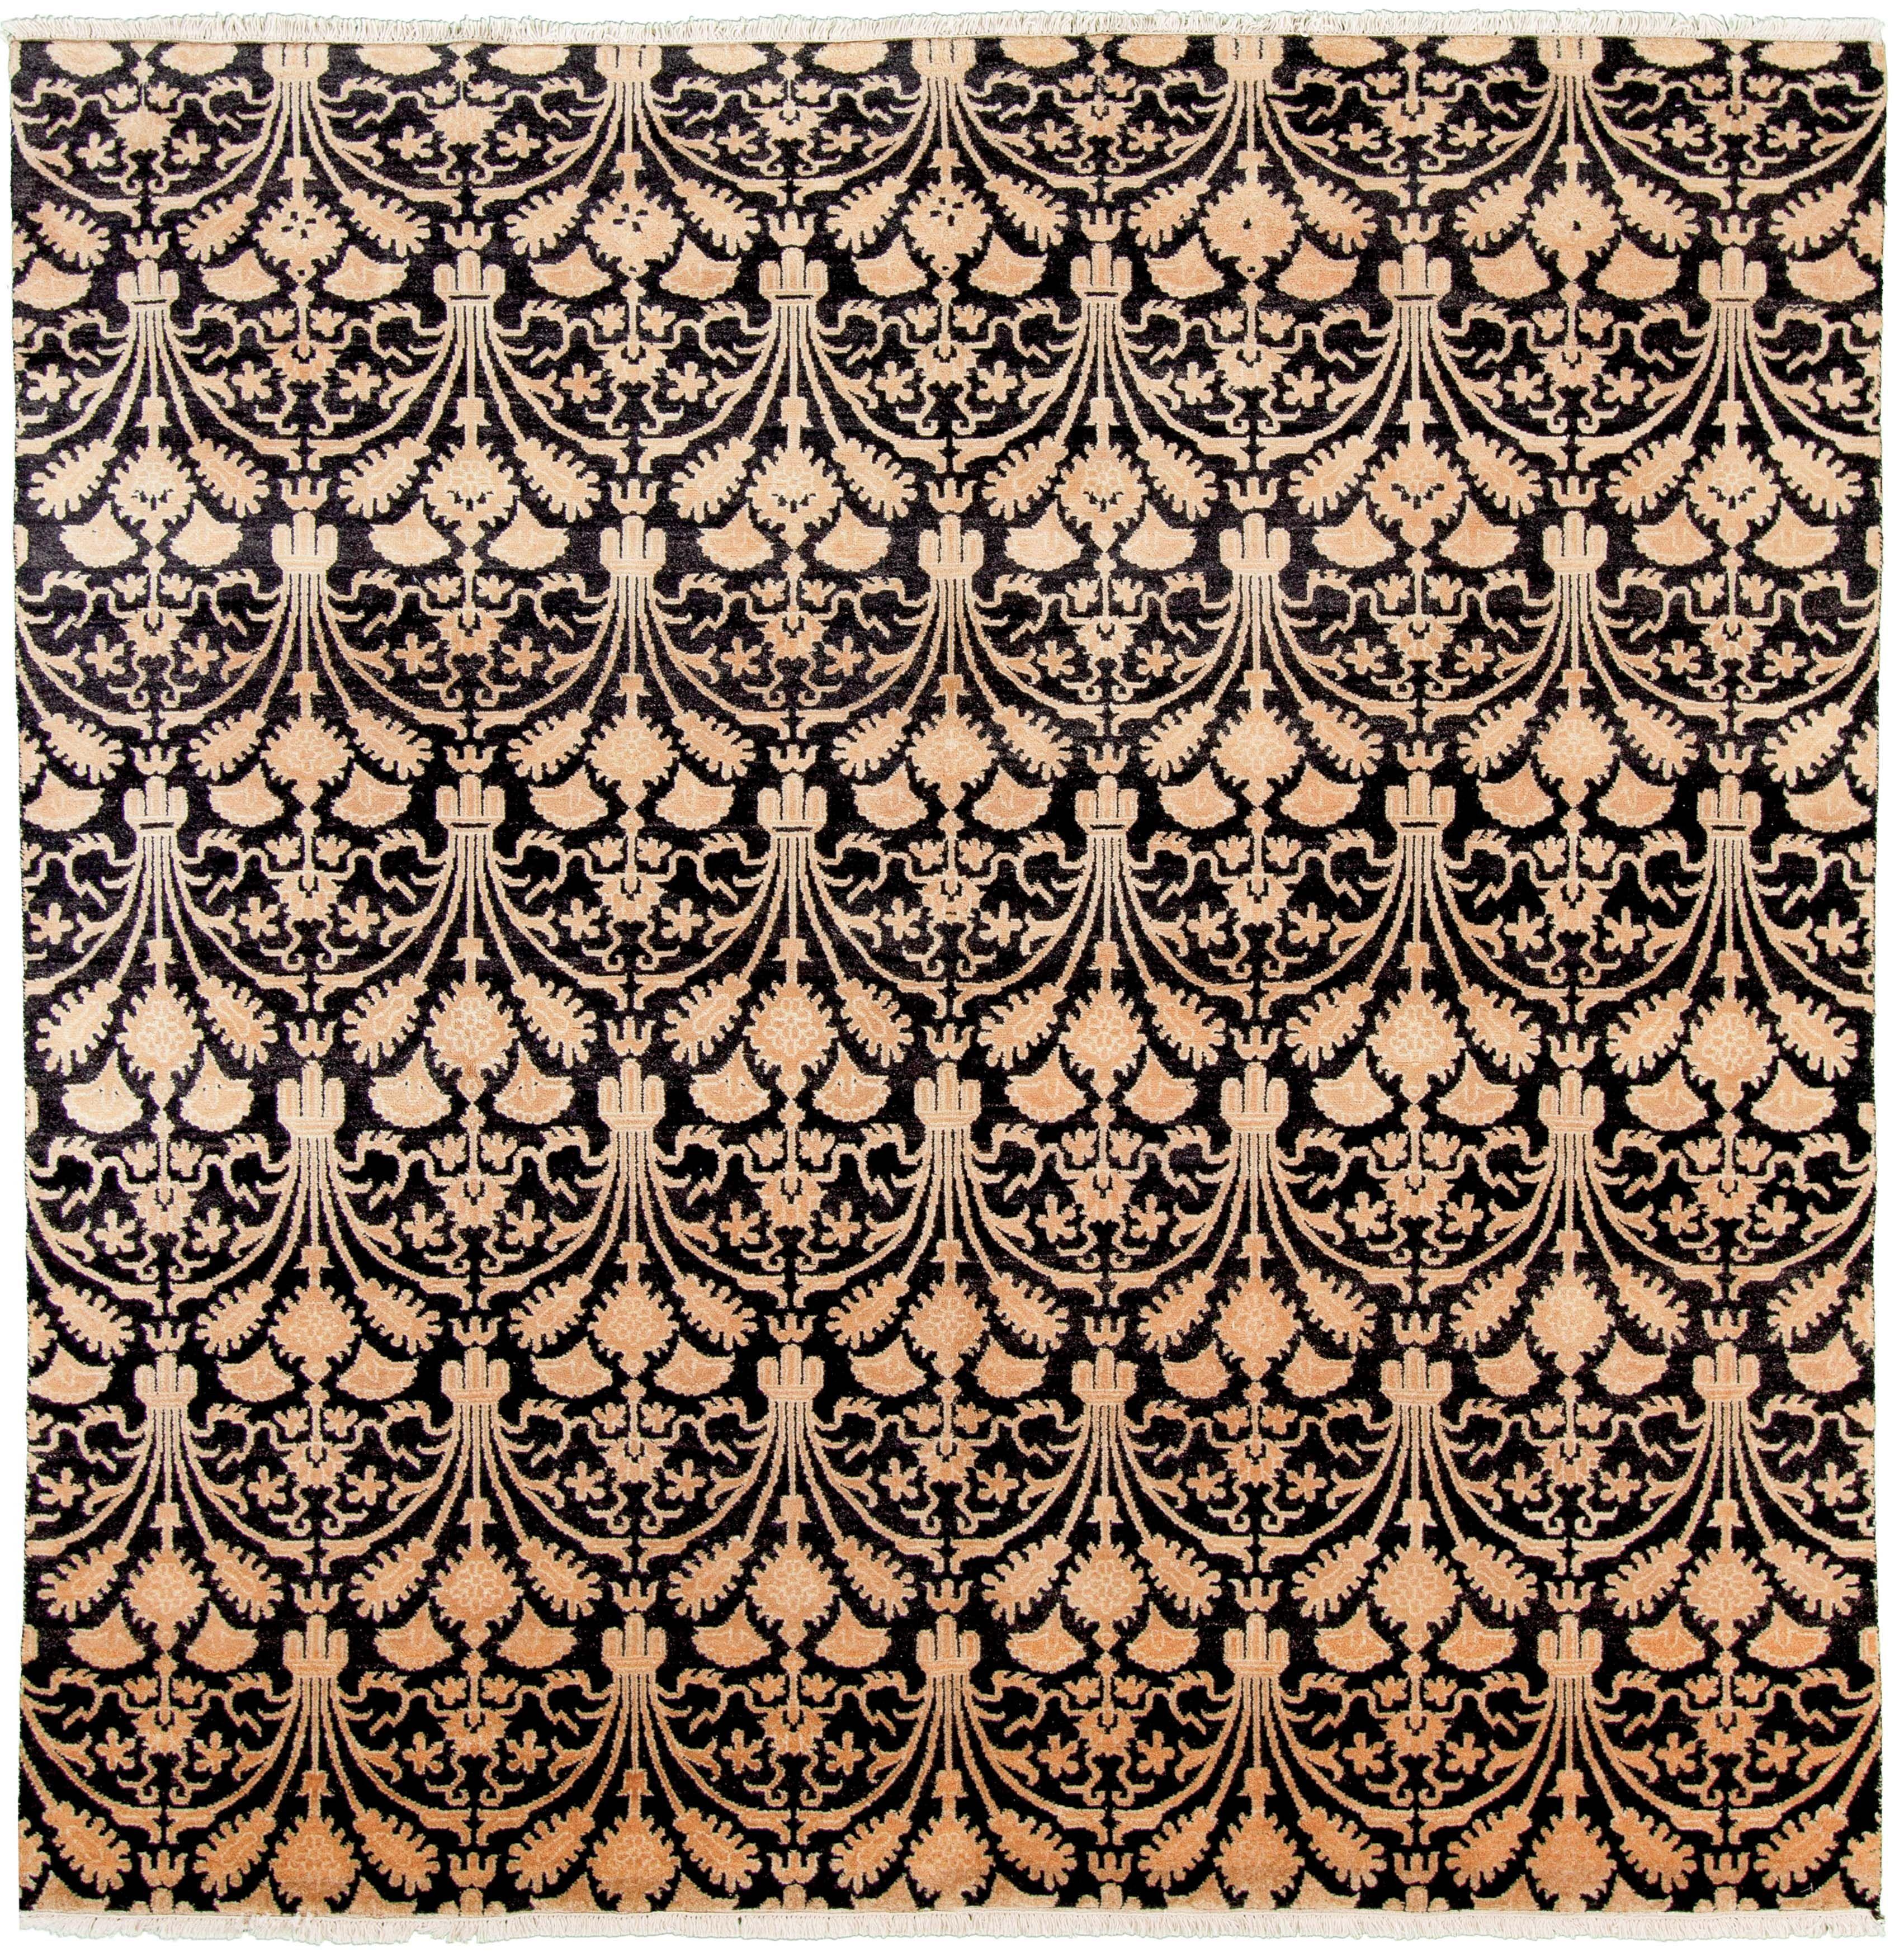 Indian Shalimar 7 8 X 7 9 Hand Knotted Wool Black Rug Ecarpetgallery